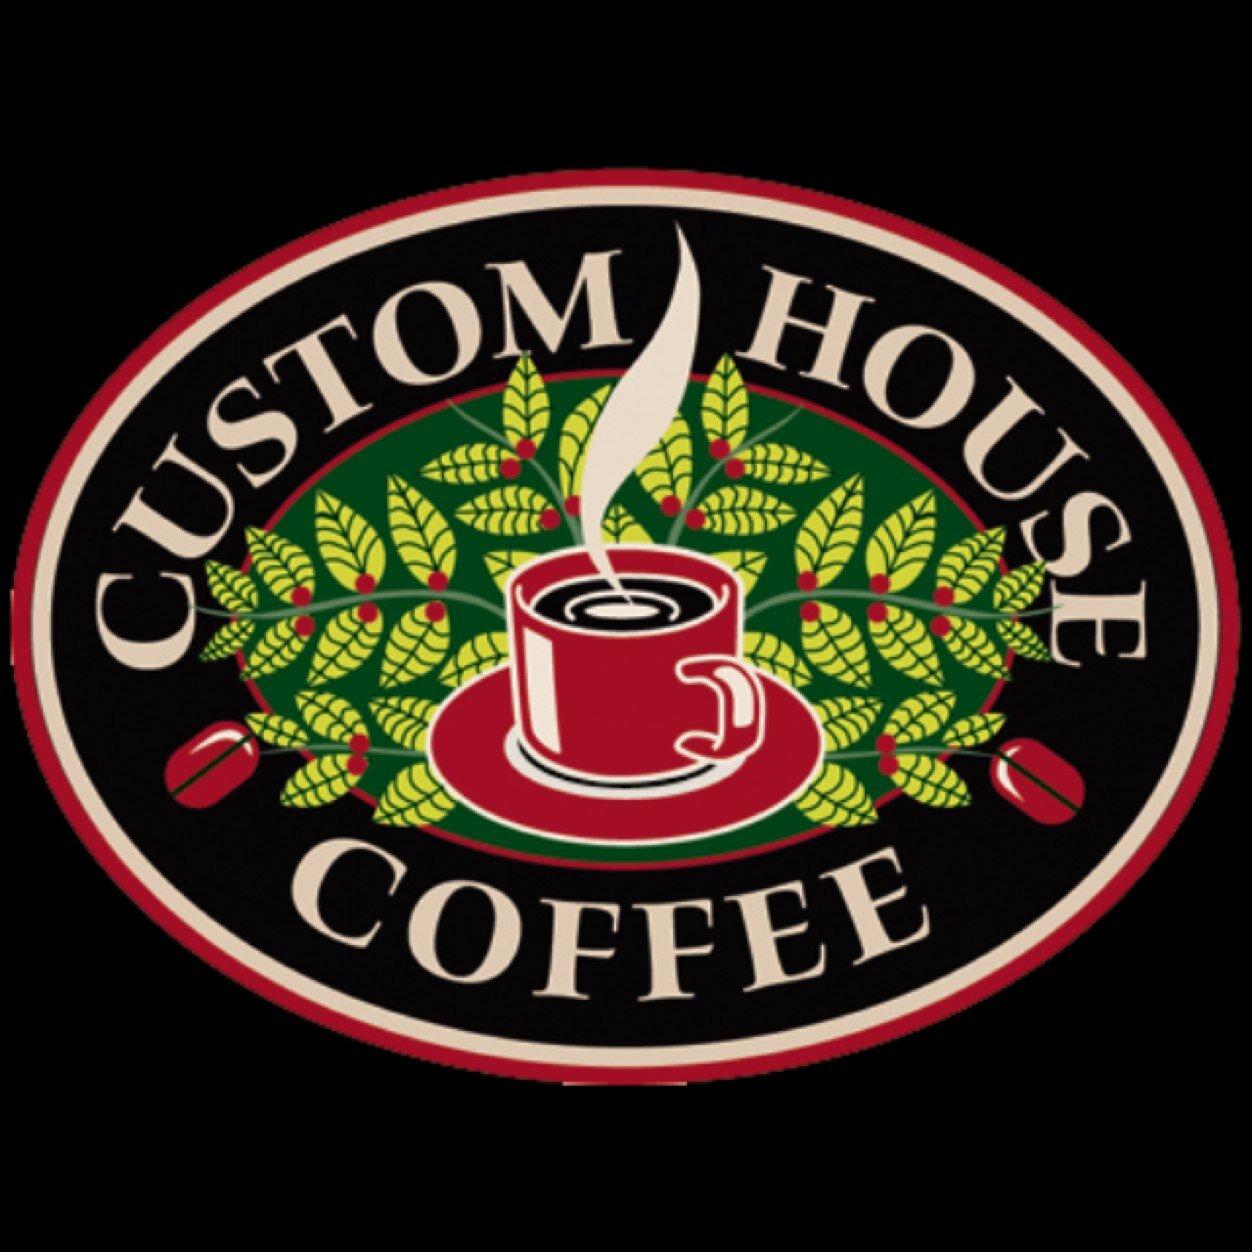 Custom House Coffee Chc796 Twitter